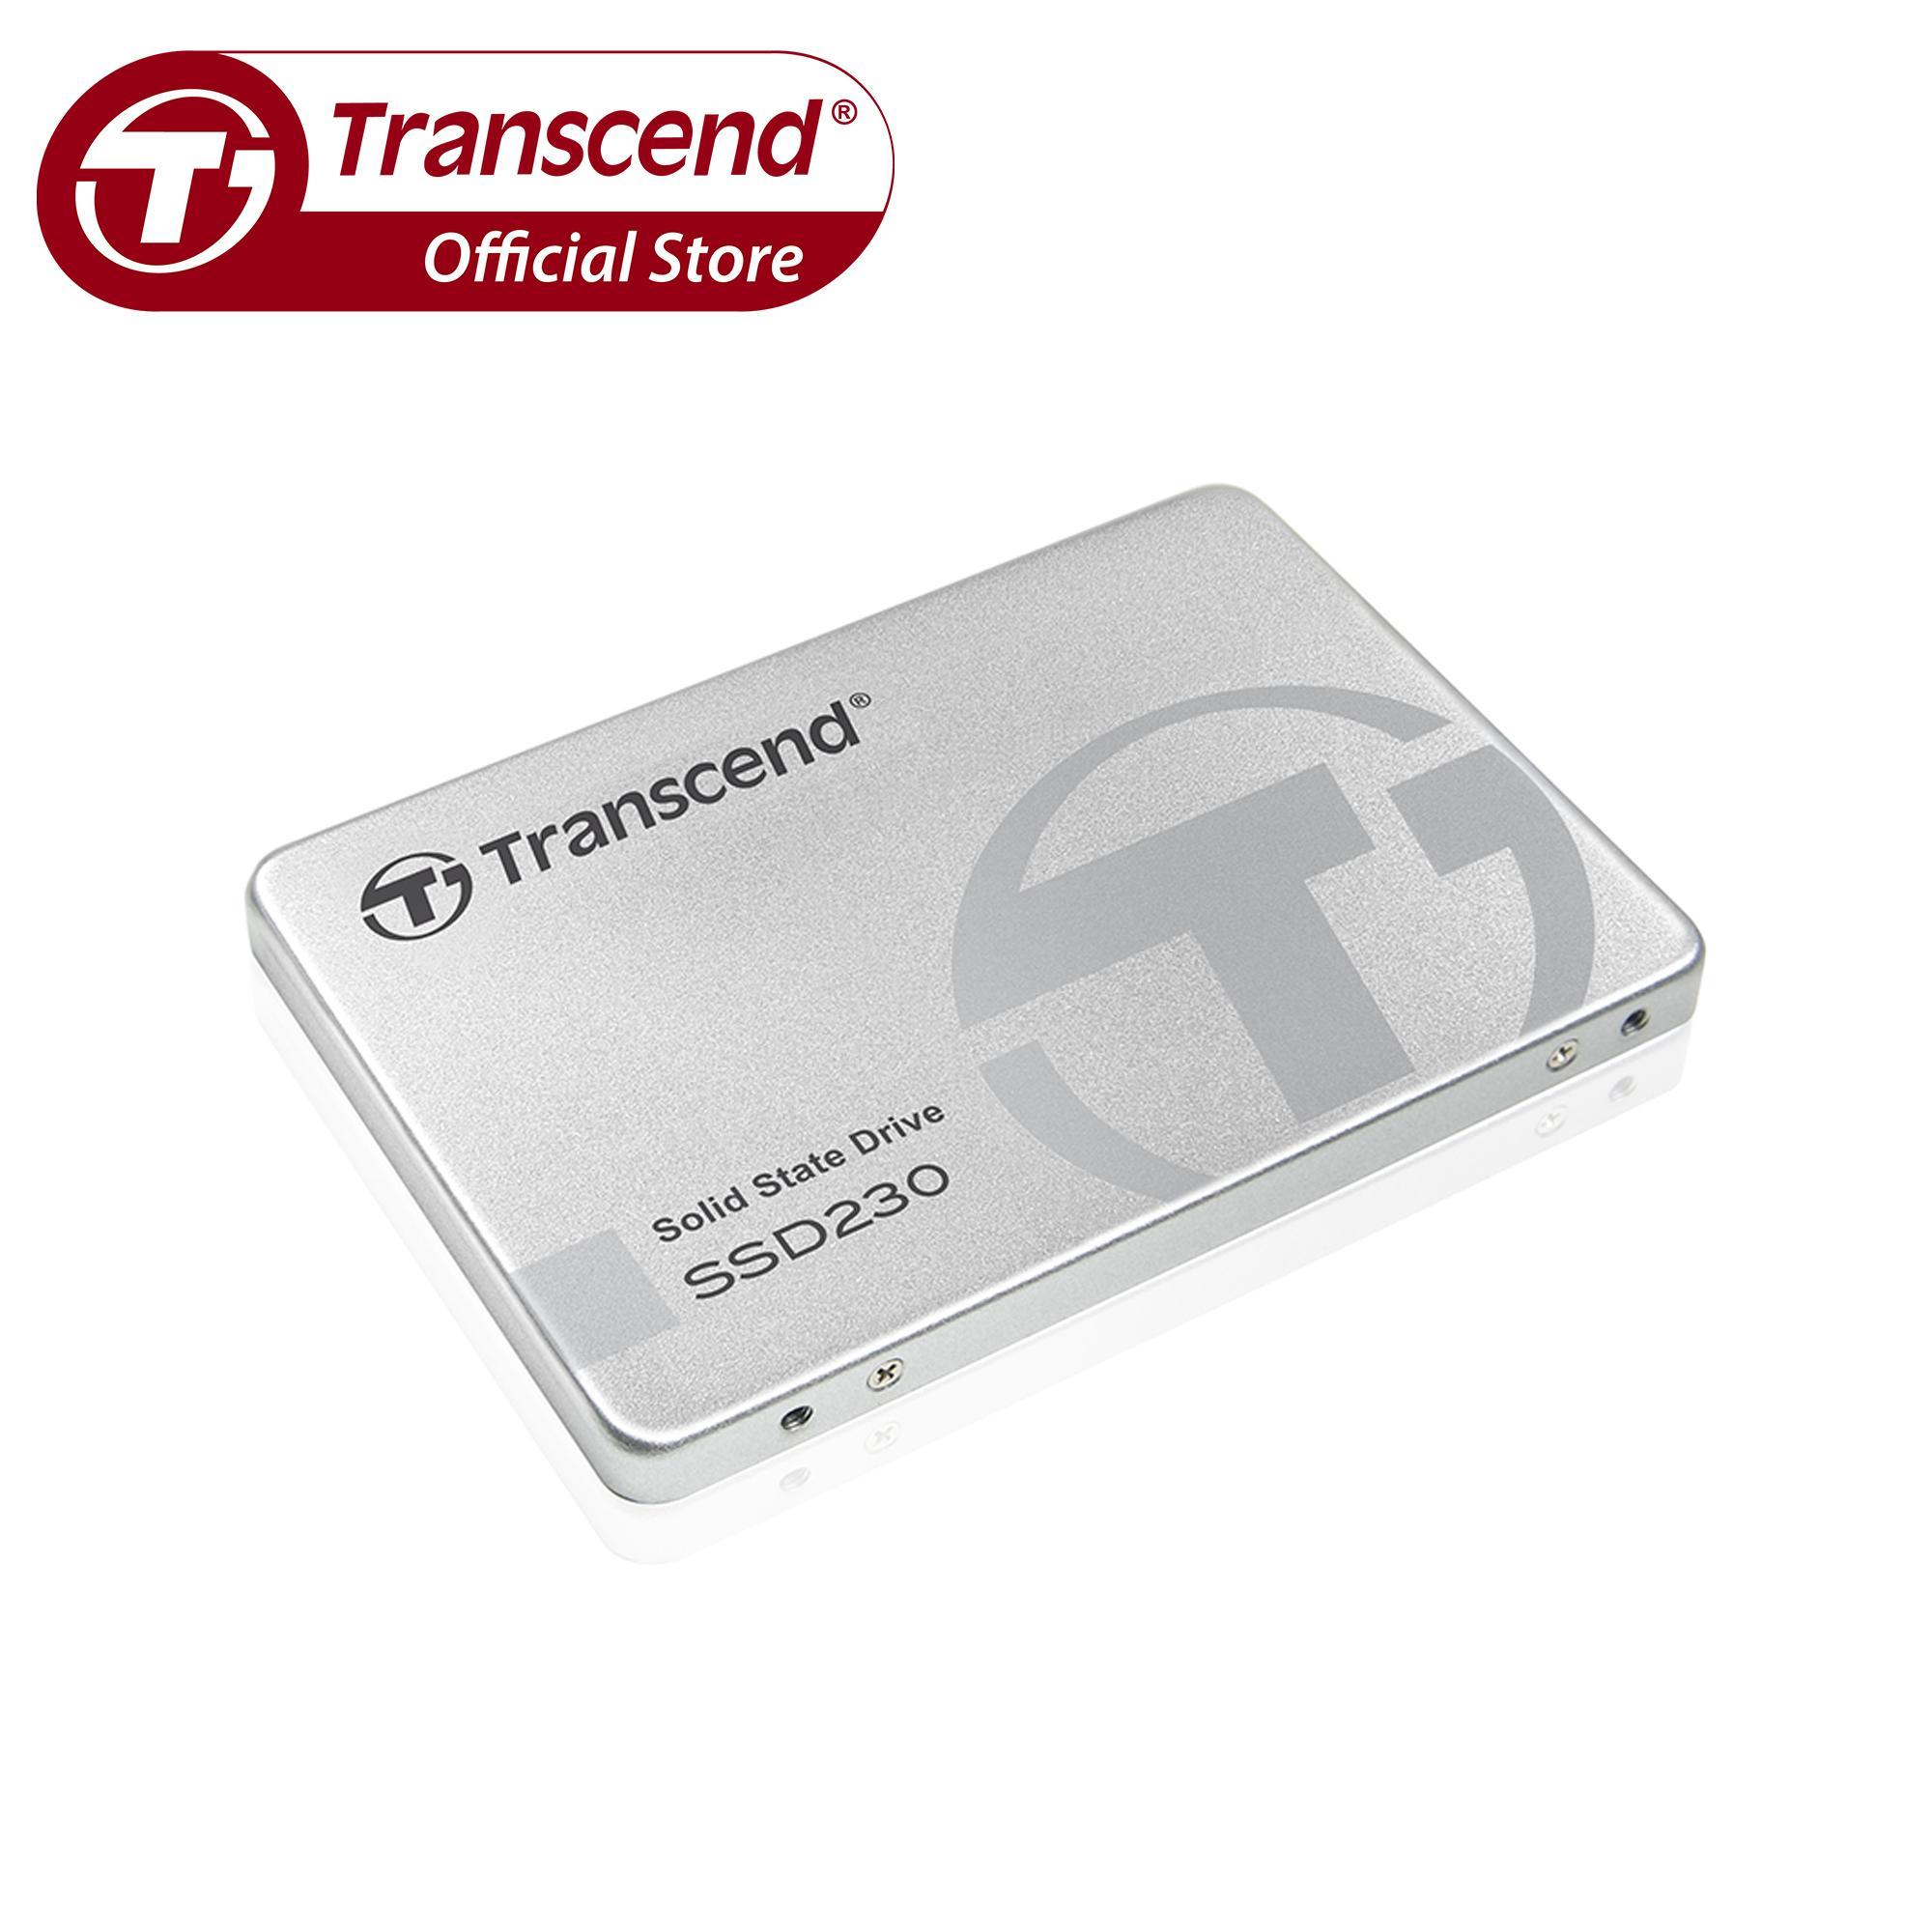 Lowest Price Transcend Ssd230S 128Gb Sata 6Gb S 2 5 Solid State Drive Aluminium Case